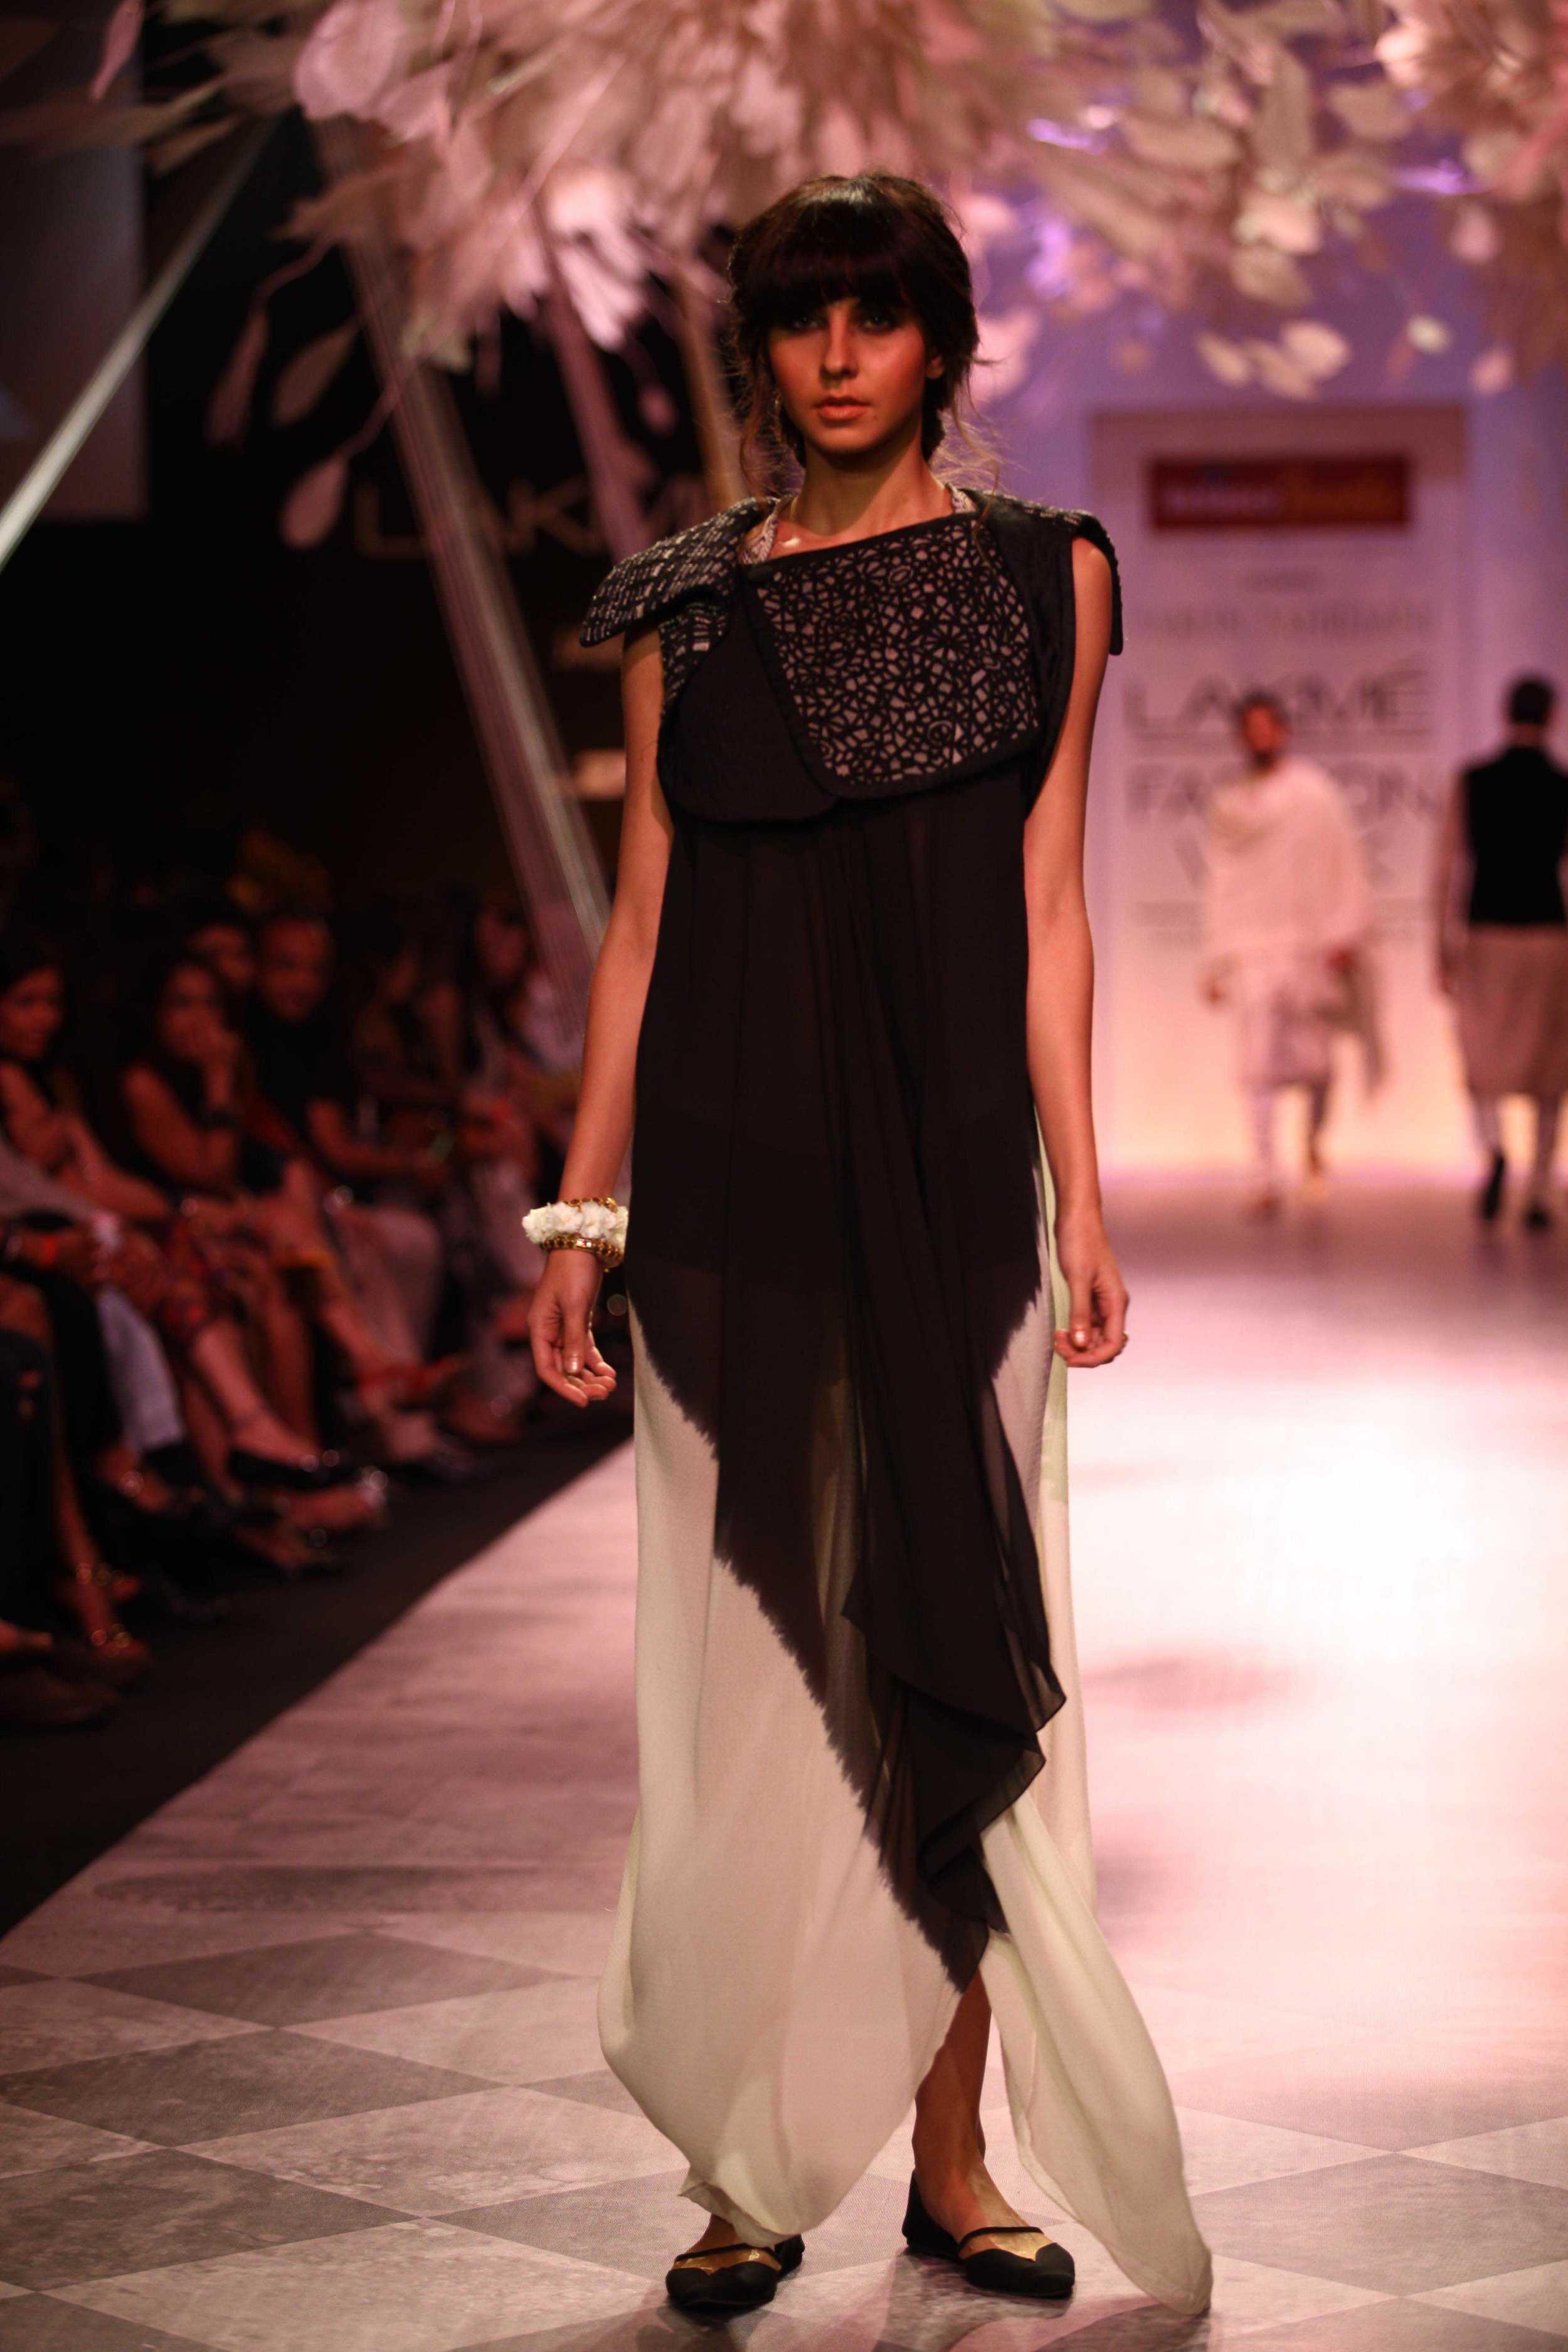 Tarun Tahiliani SS'14 Collection at LFW SR 2014 5.jpg